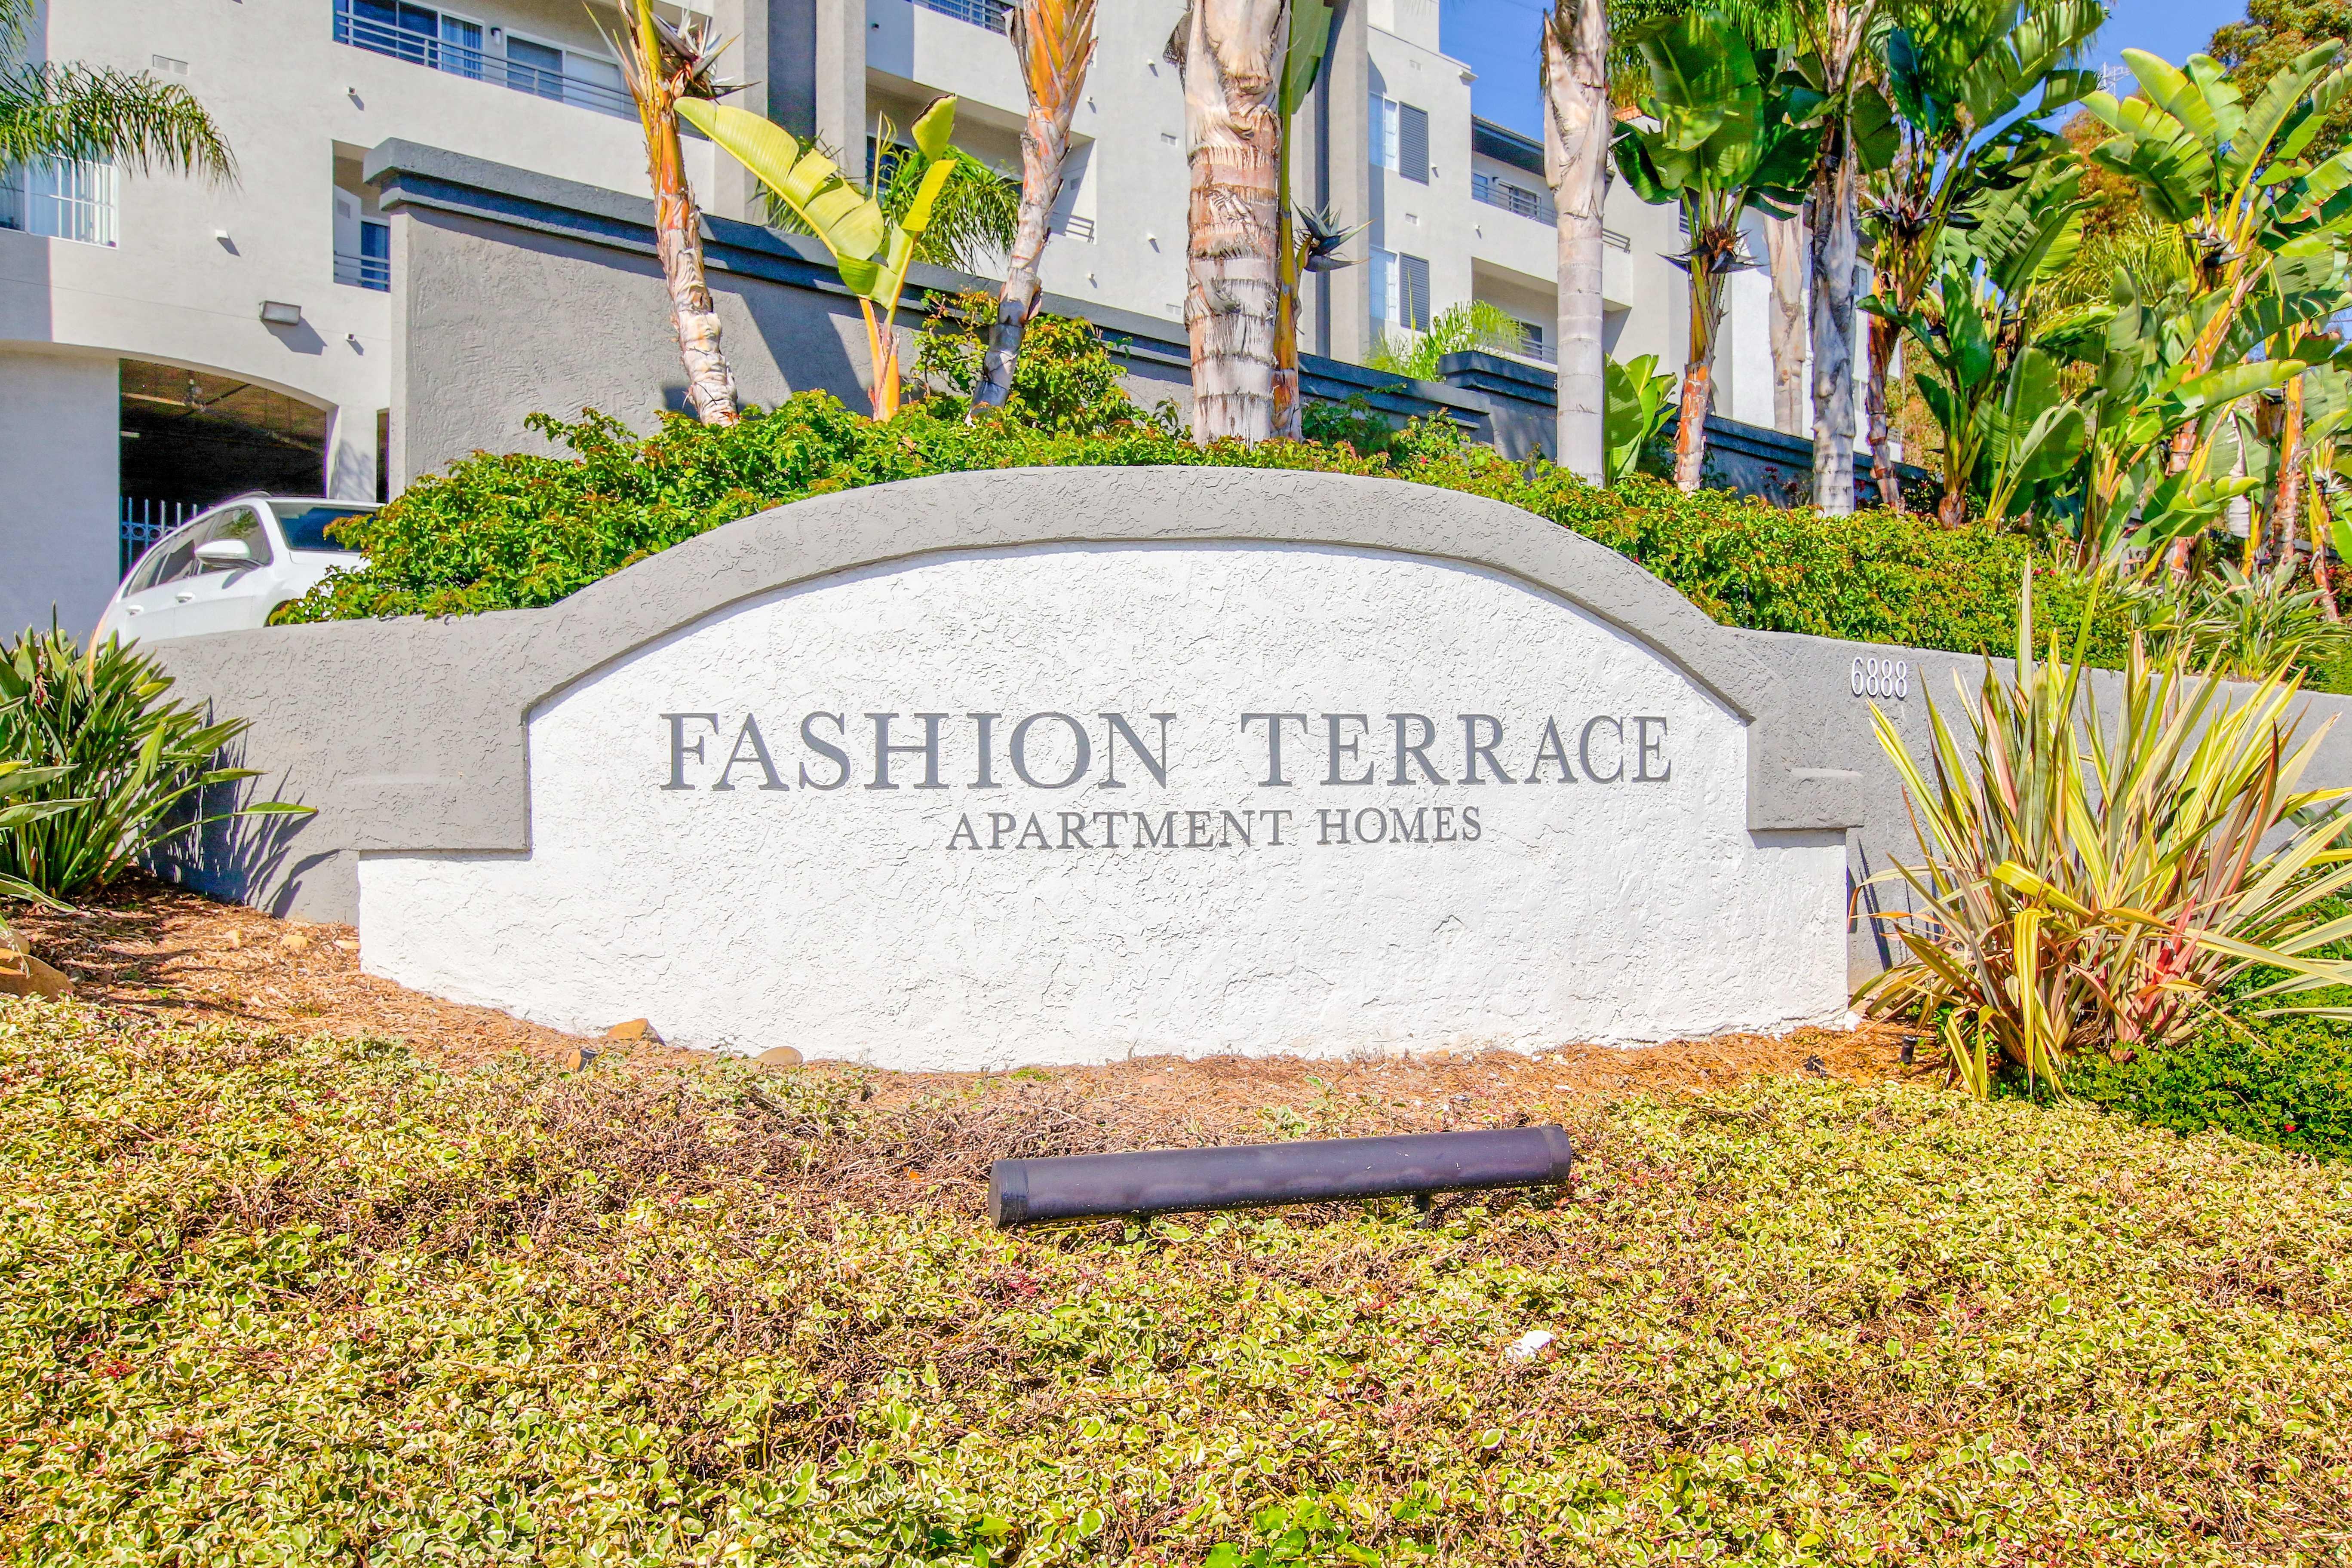 Apartment sign in San Diego, California